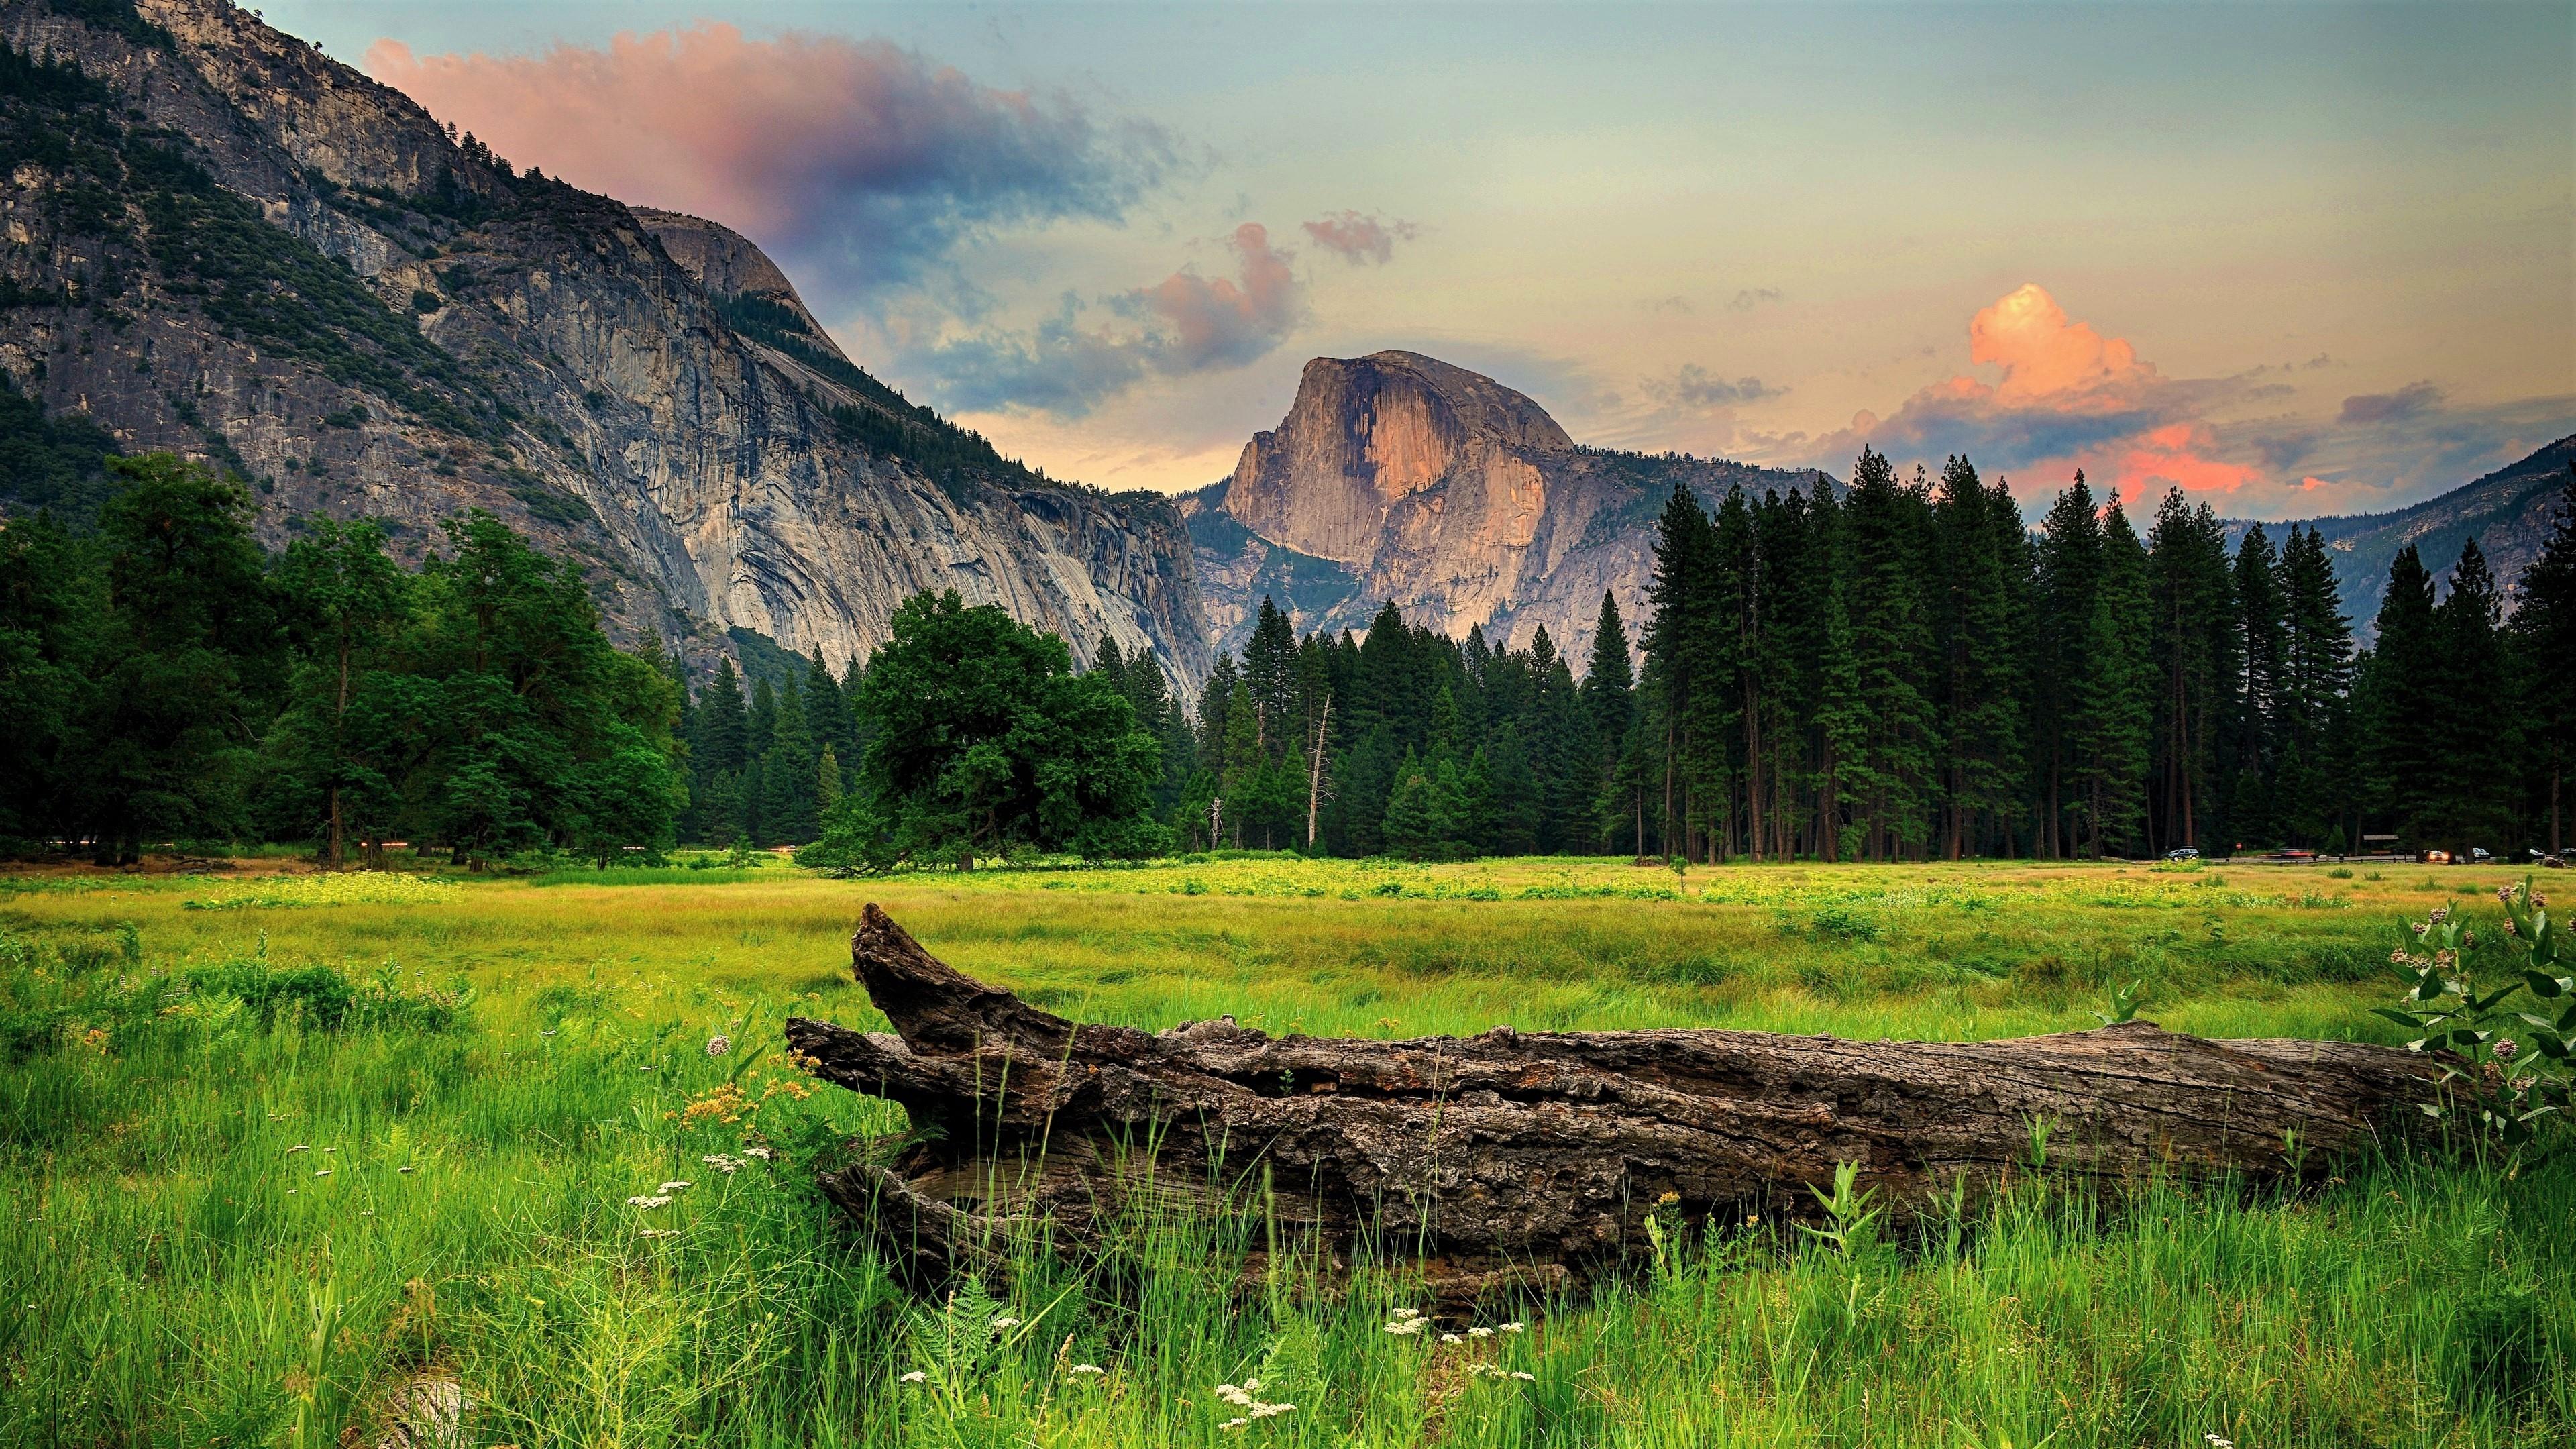 Mountain landscape 4k ultra hd wallpaper background - Nature wallpaper 8k ...